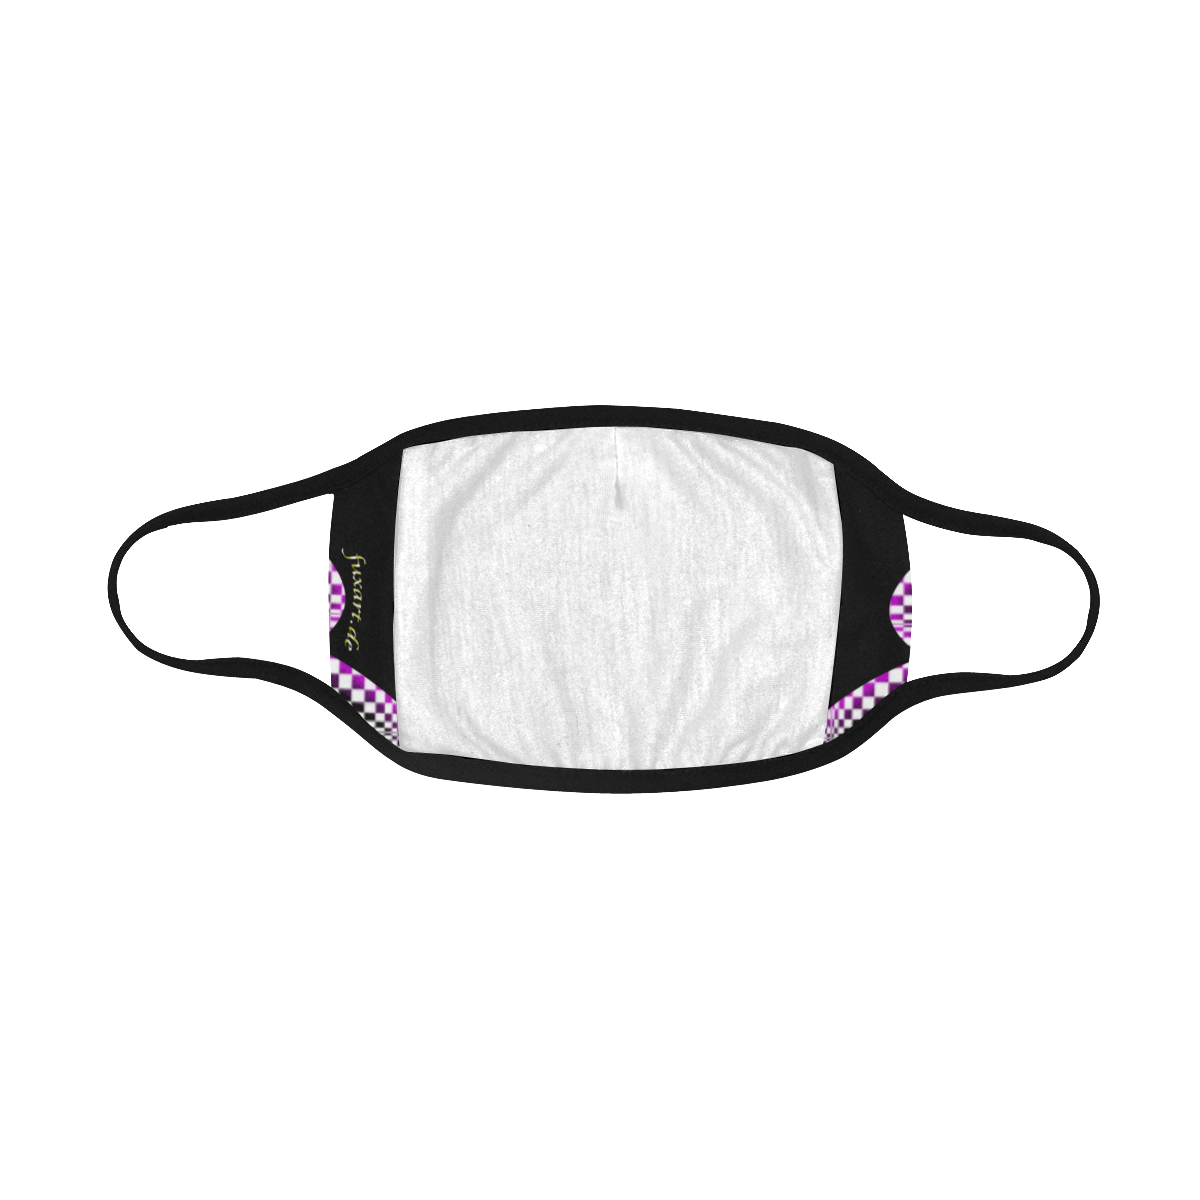 PARANOIA MASK Mouth Mask